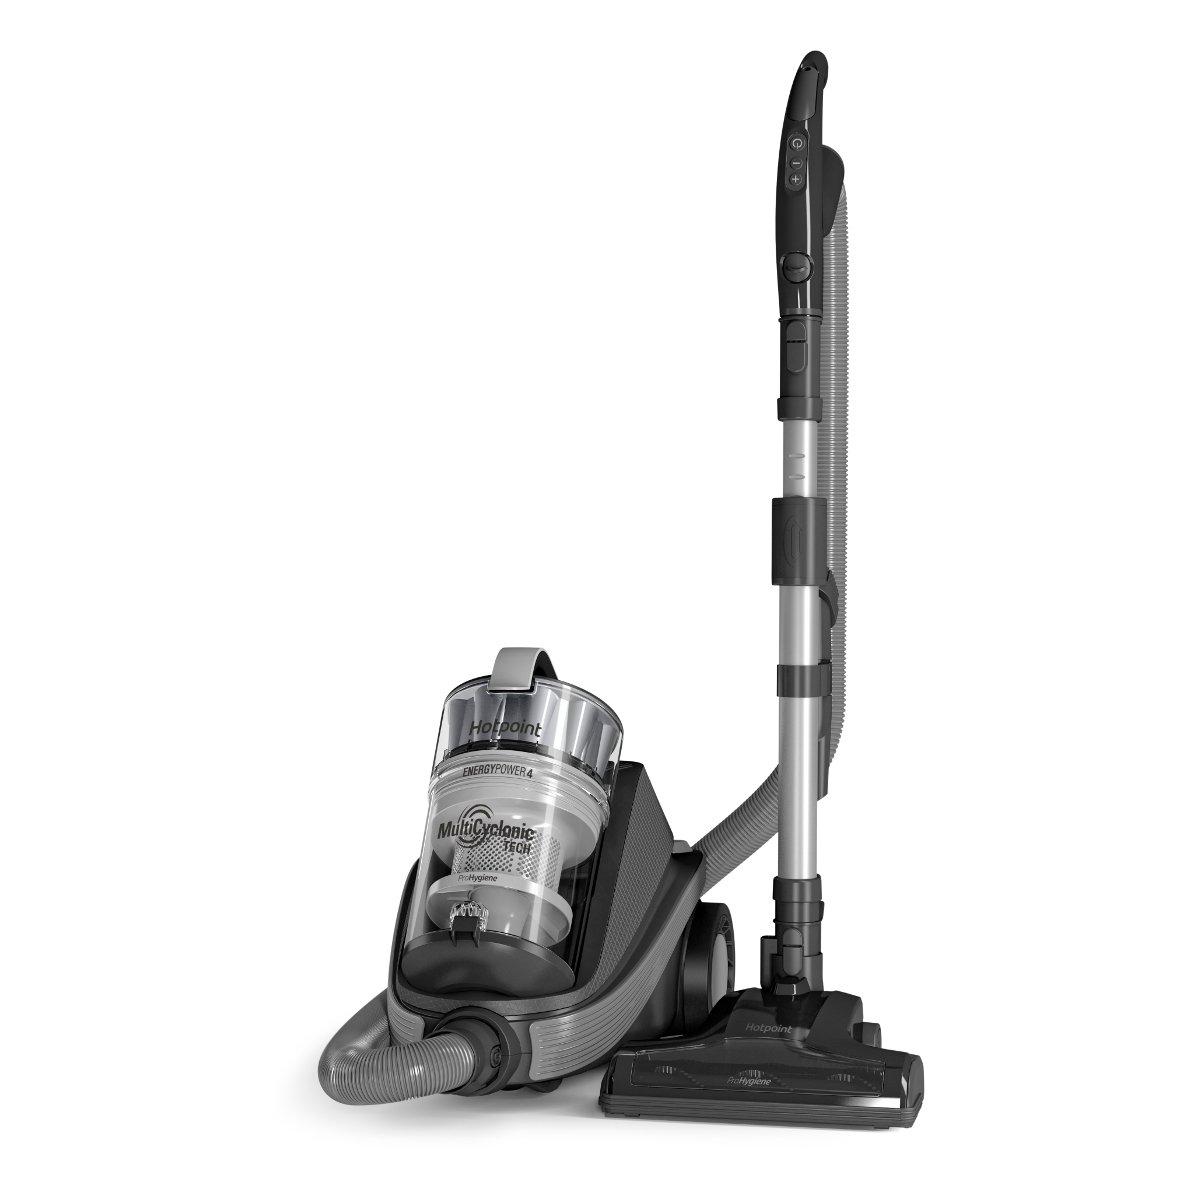 Grey Hotpoint SLM07A4HBUK Multicyclonic Cylinder Vacuum